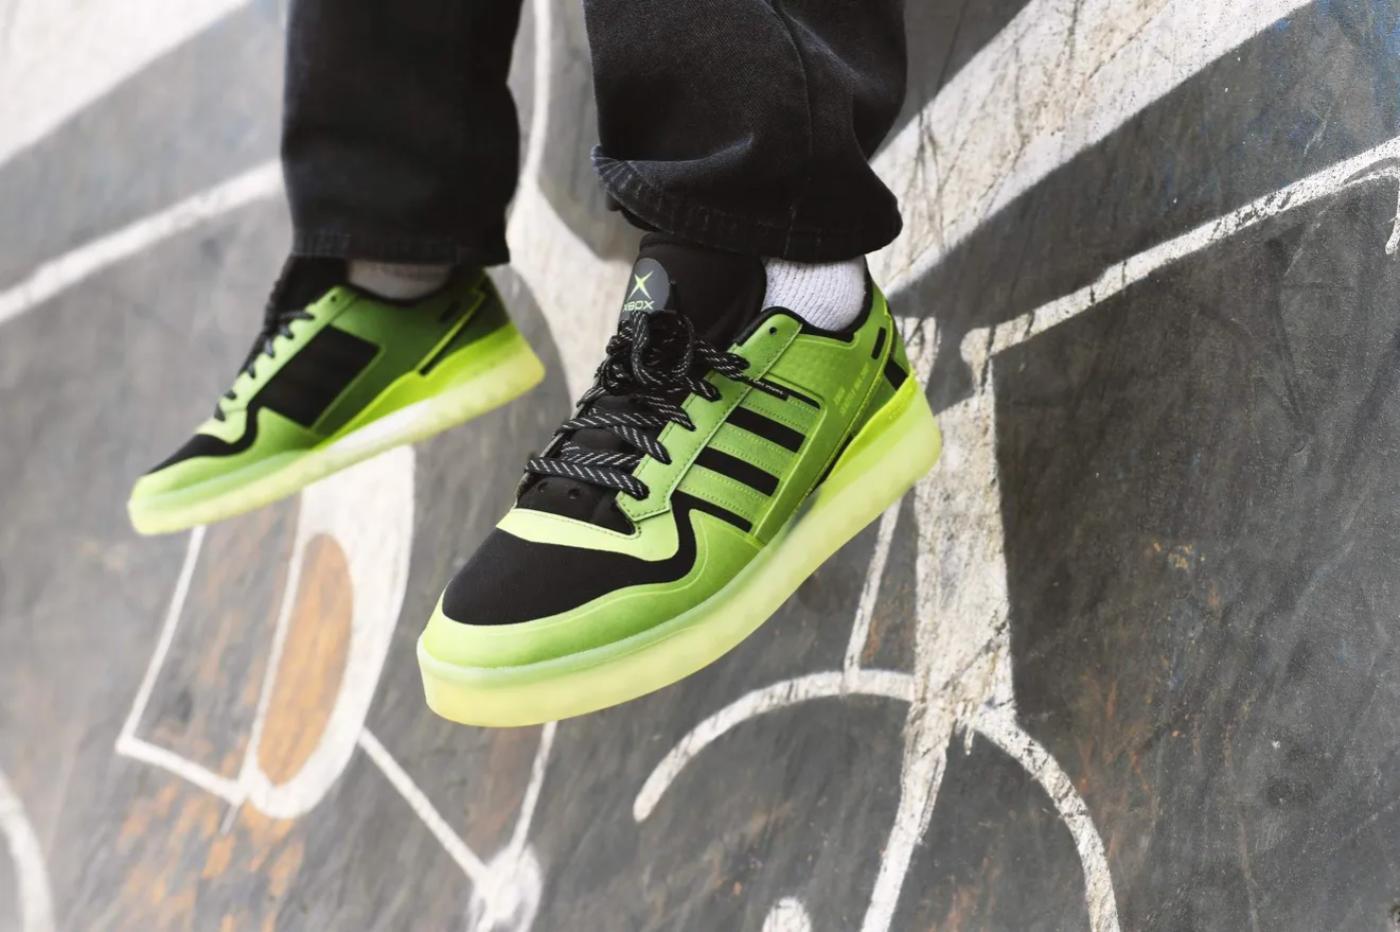 Adidas Xbox sneakers